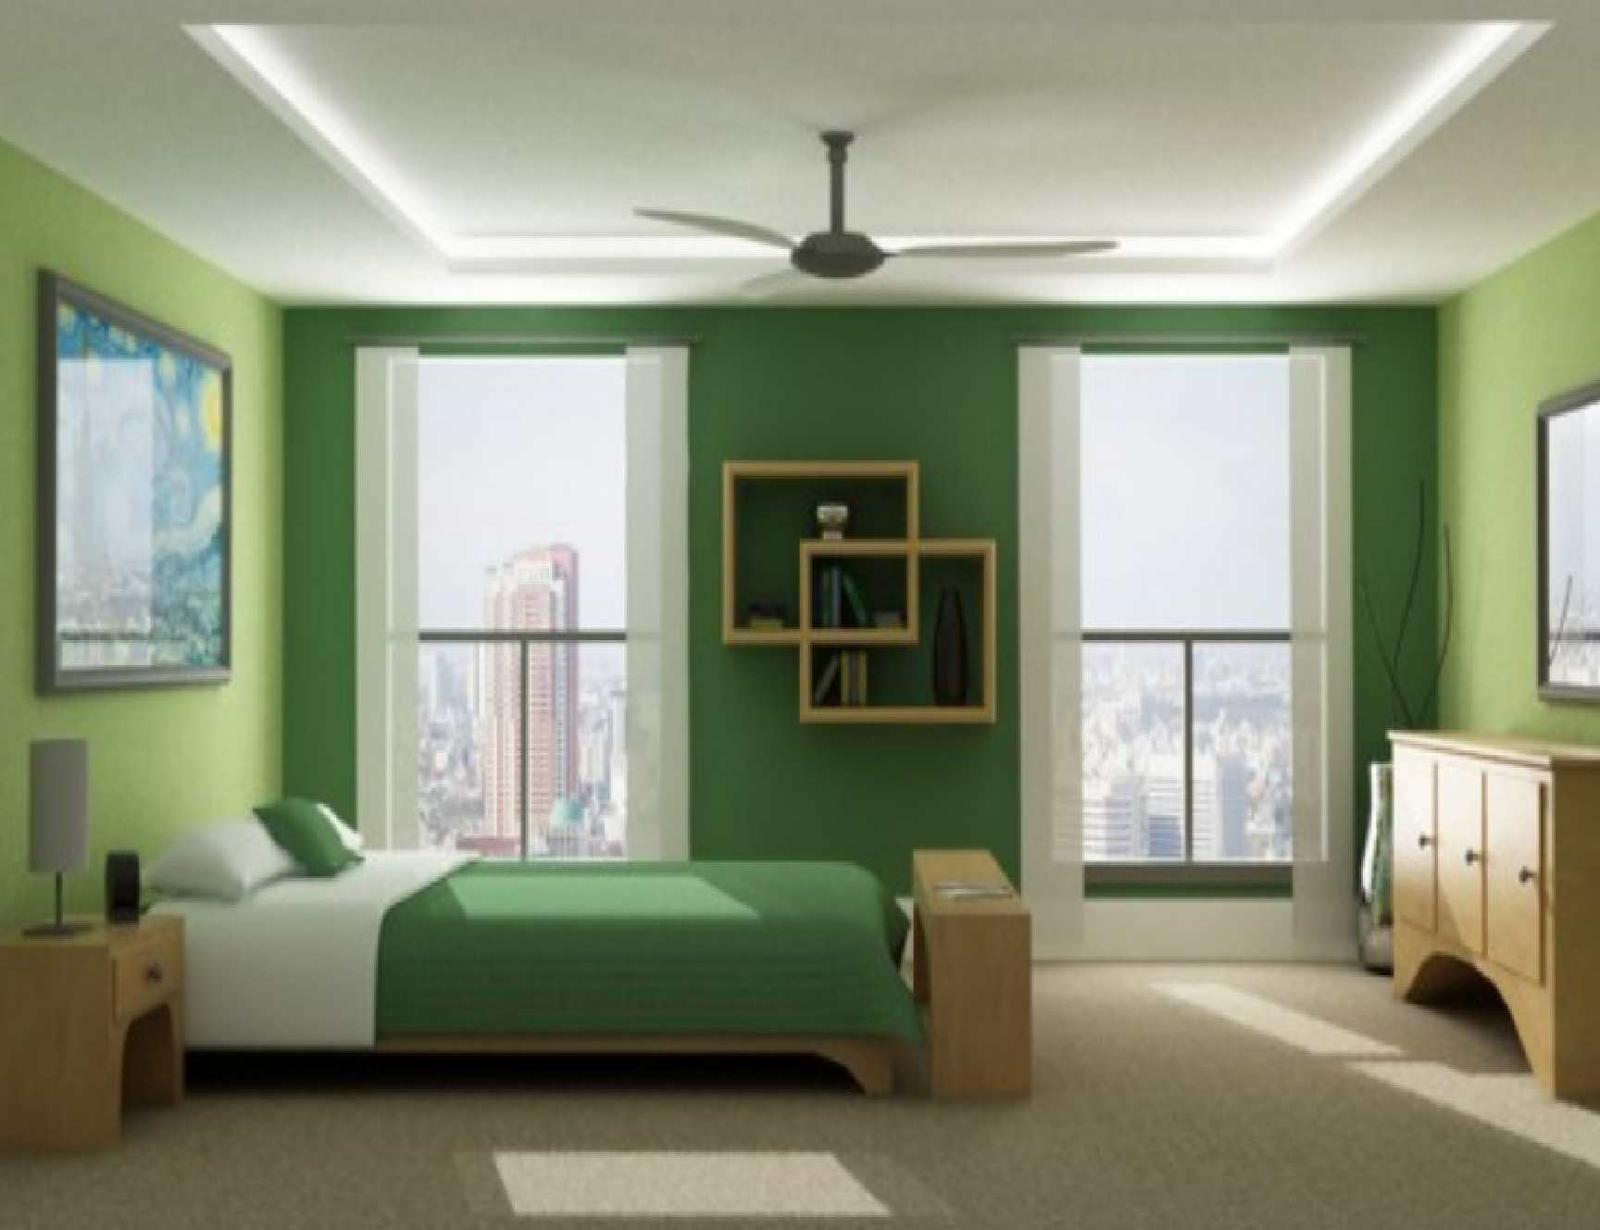 Desain Interior Apartemen Minimalis InfoMedia Digital